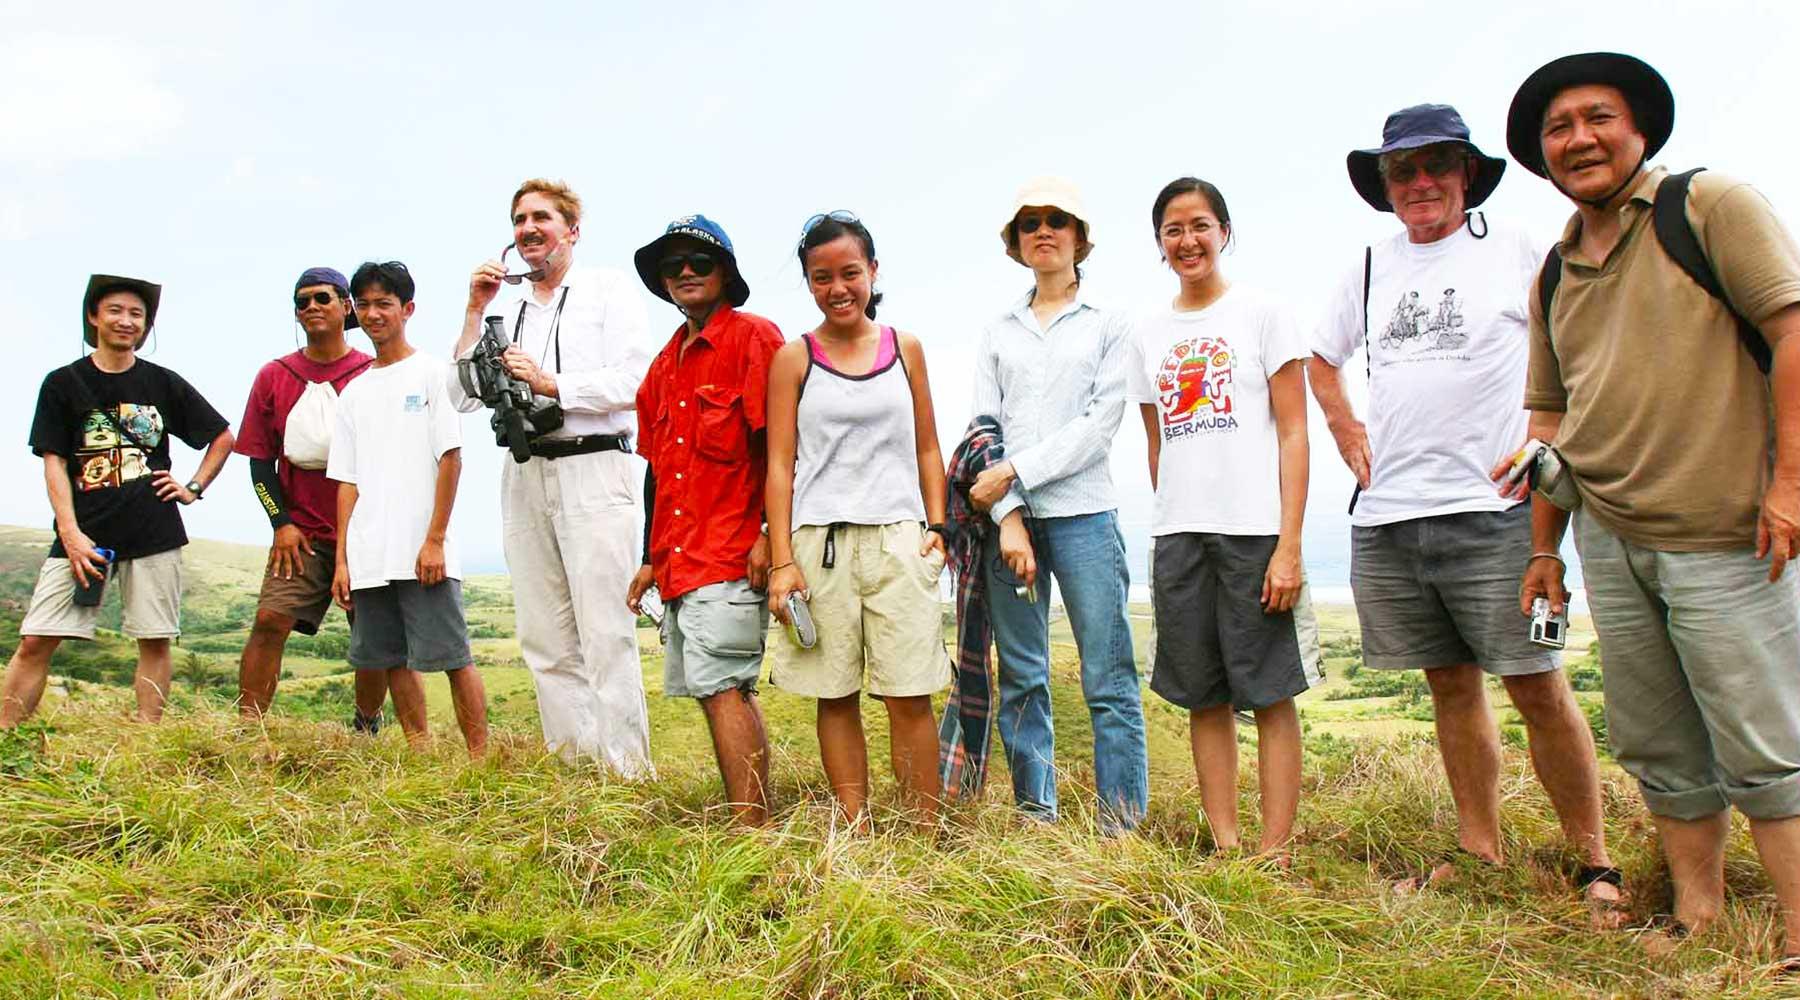 Batanes Islands Photo Journal - Peter Bellwood - Philippines Archaeology Fieldwork Team - Steven Andrew Martin